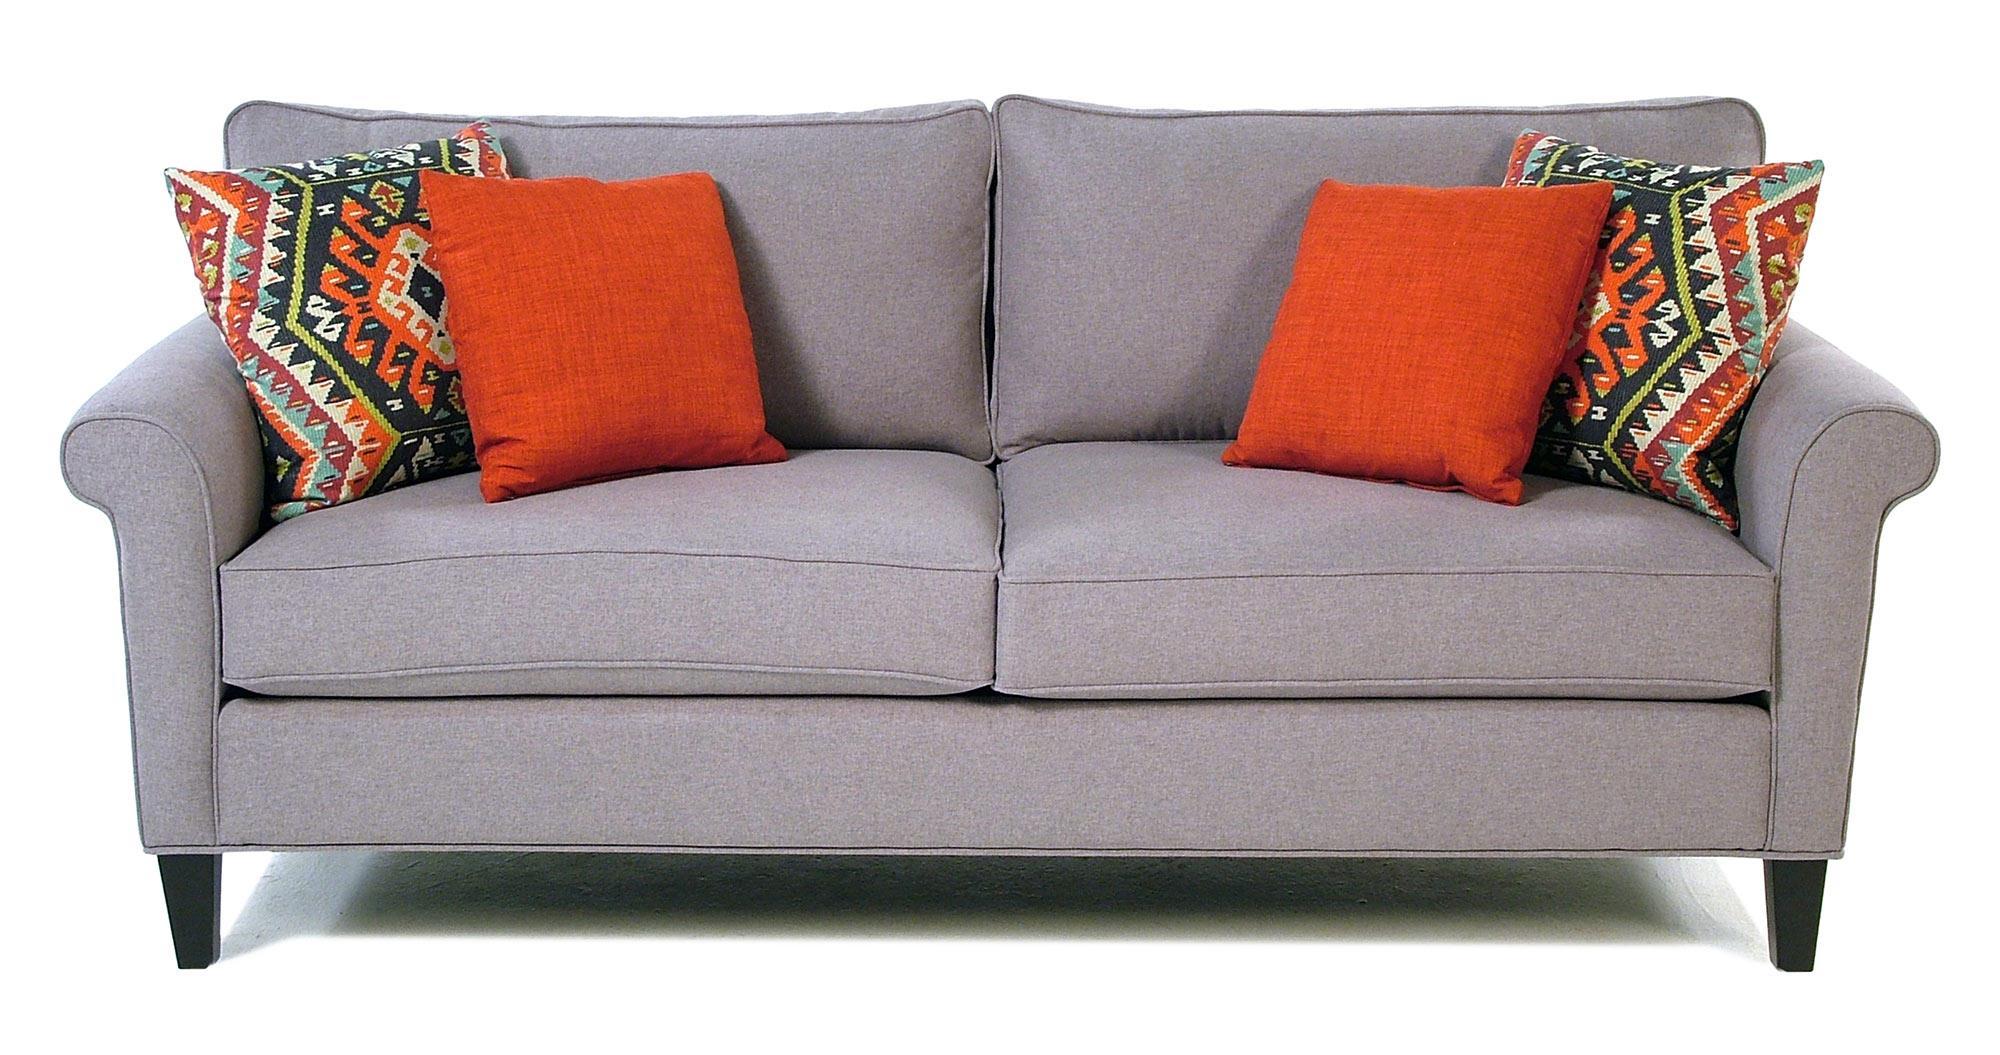 Jonathan Louis Fiesta Roll Arm Sofa   Item Number: 10230 DH